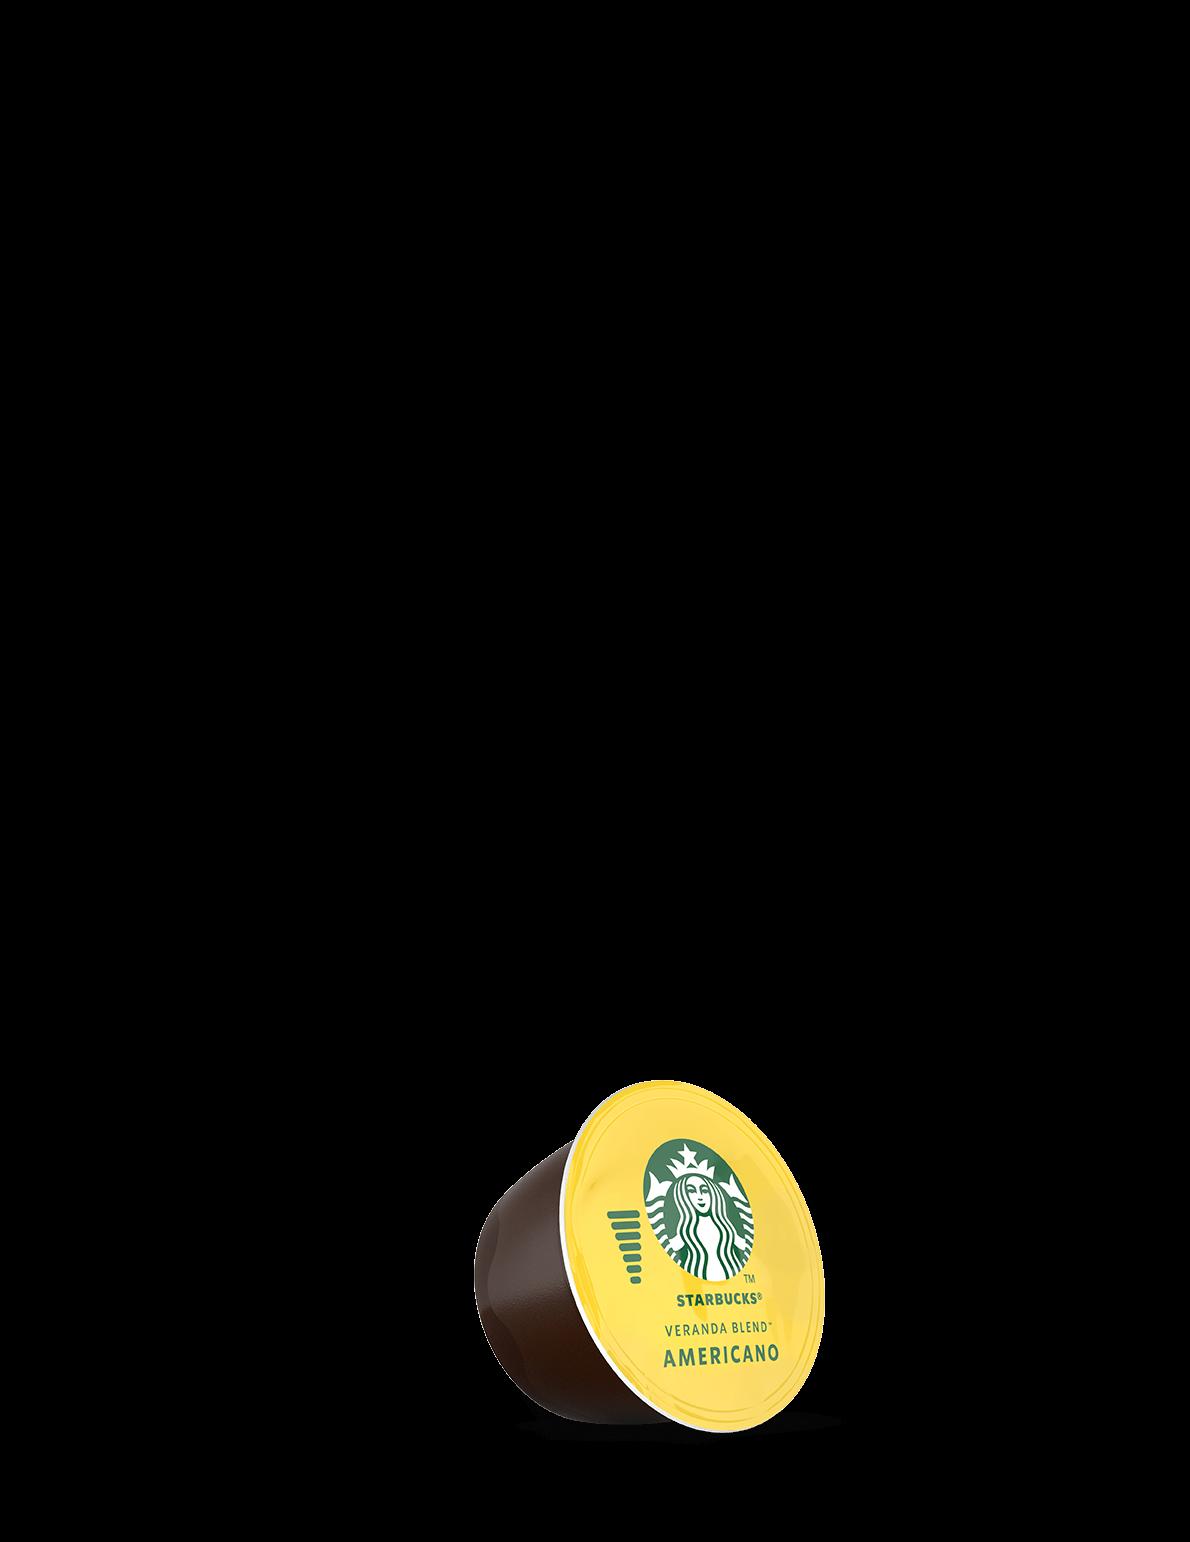 Cápsulas Starbucks® Veranda Blend™